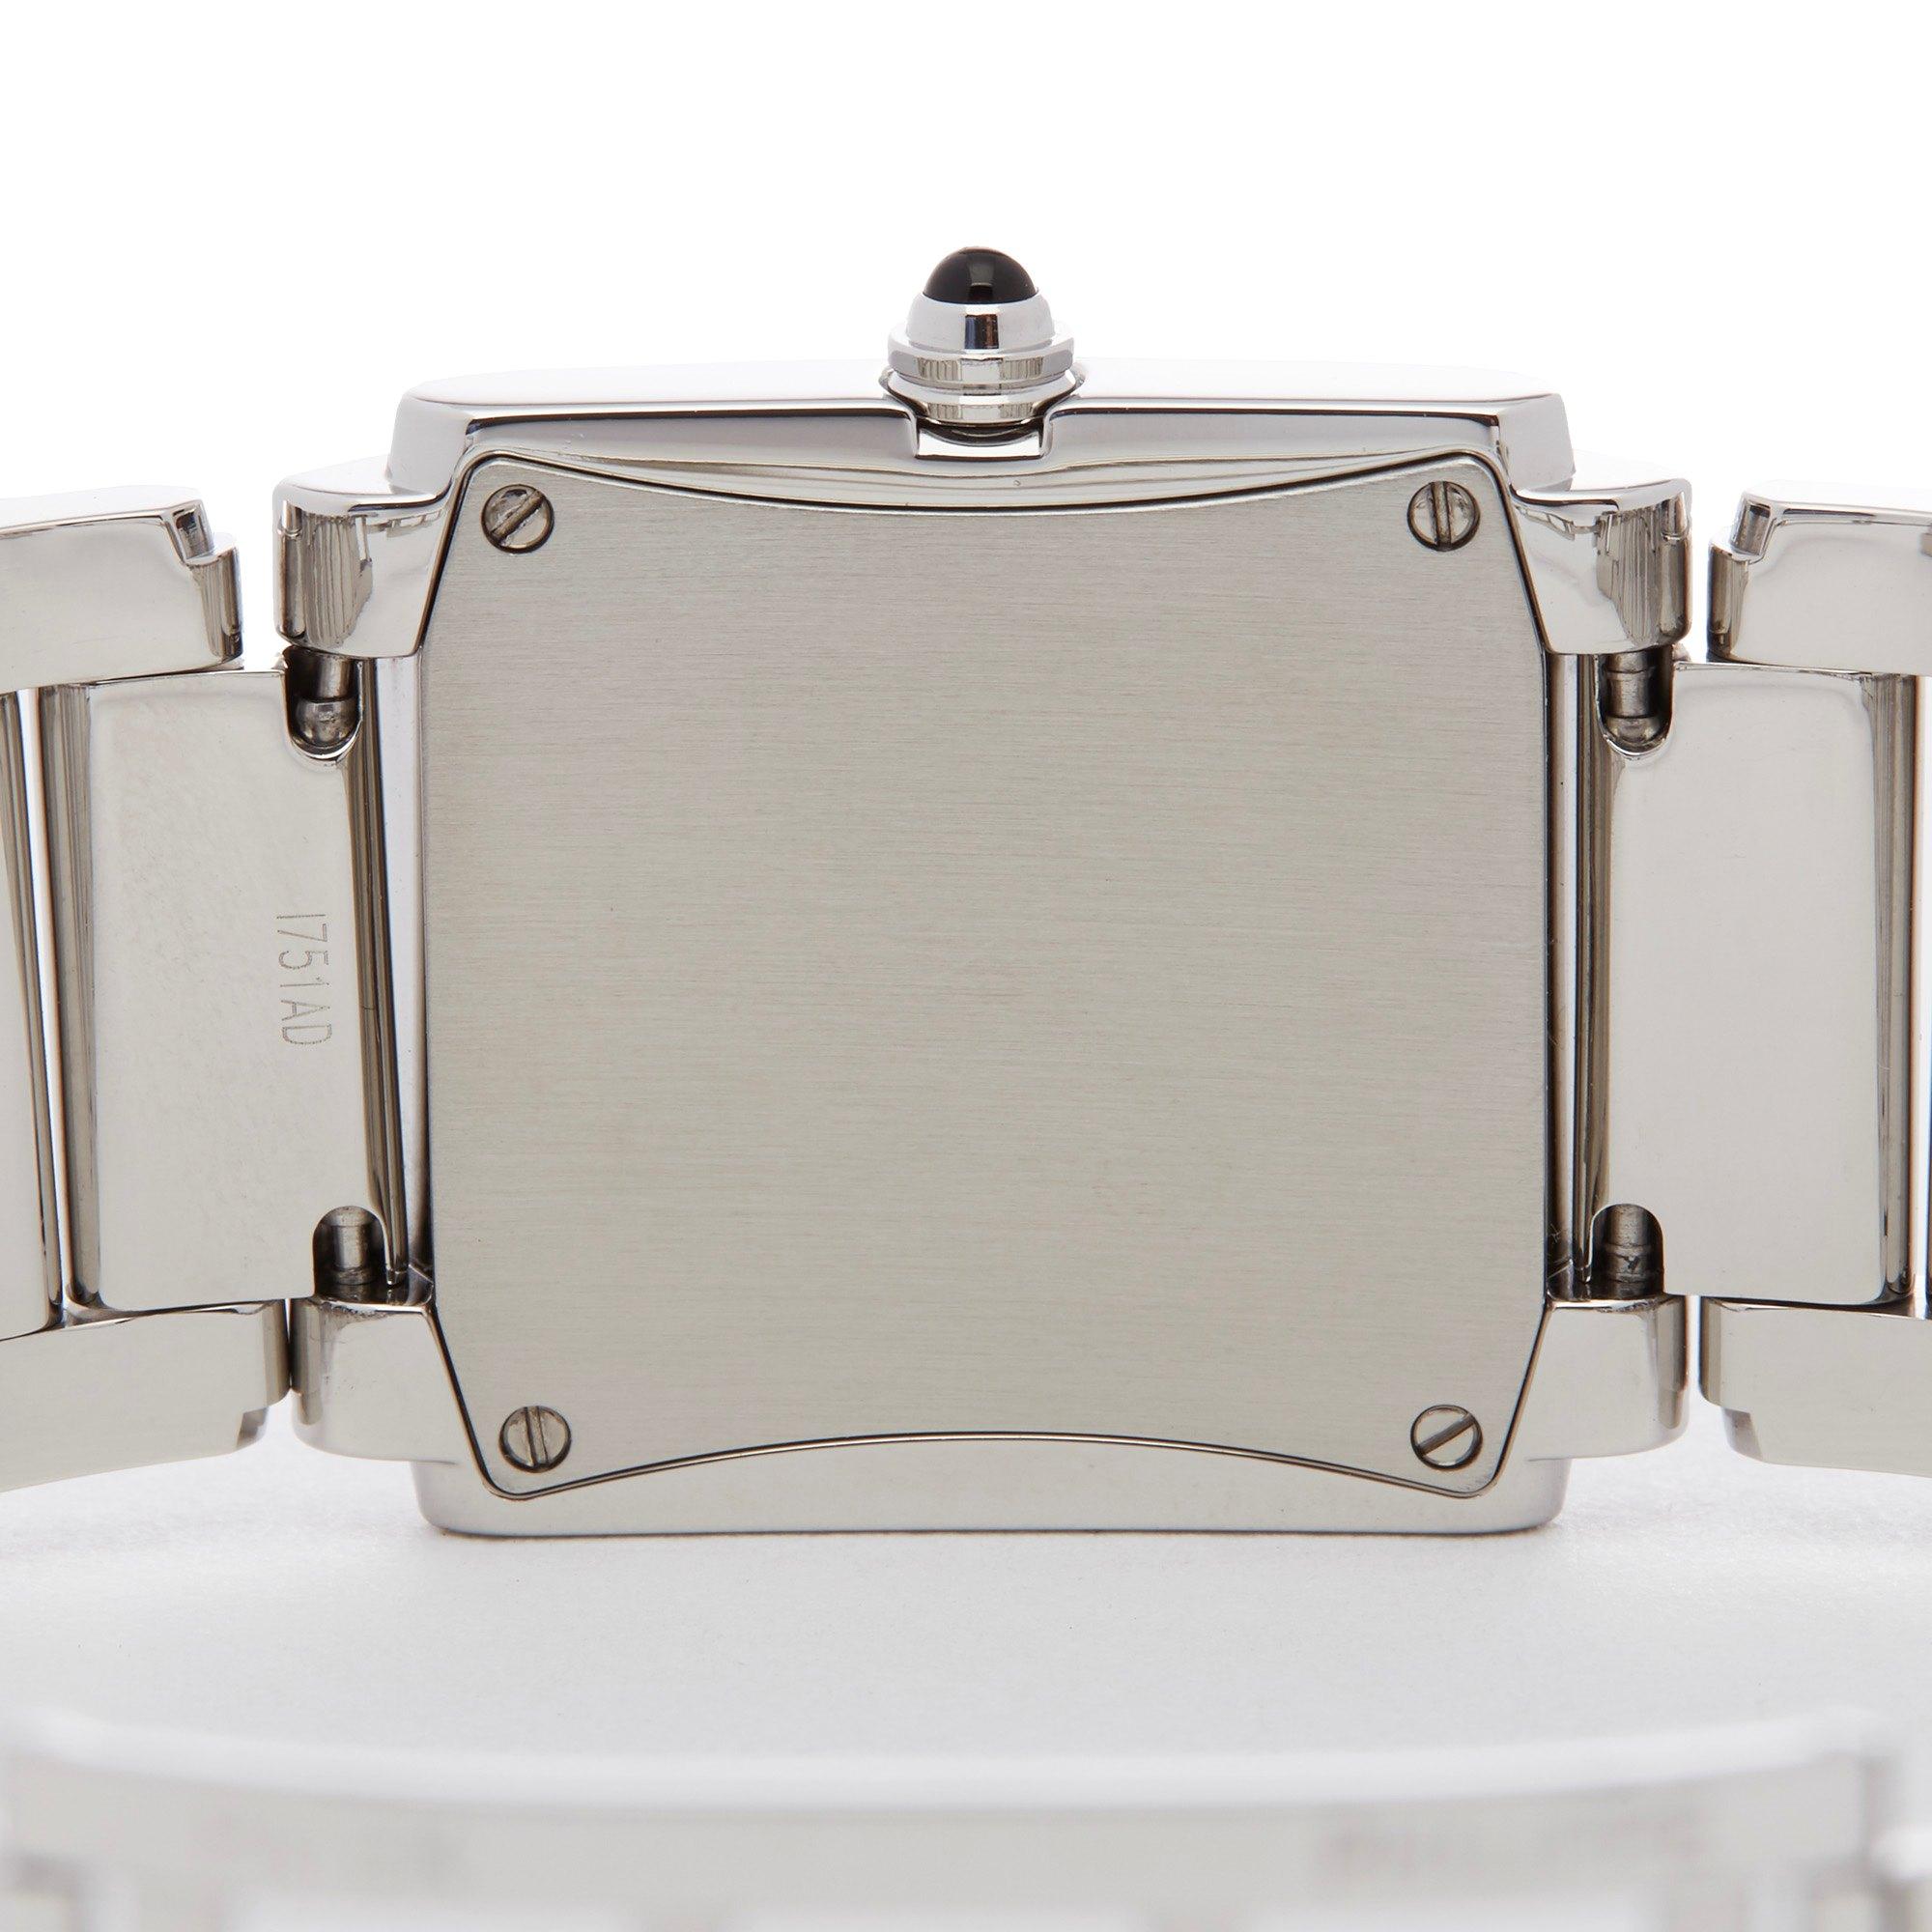 Patek Philippe Twenty-4 Diamond Stainless Steel 4910-10